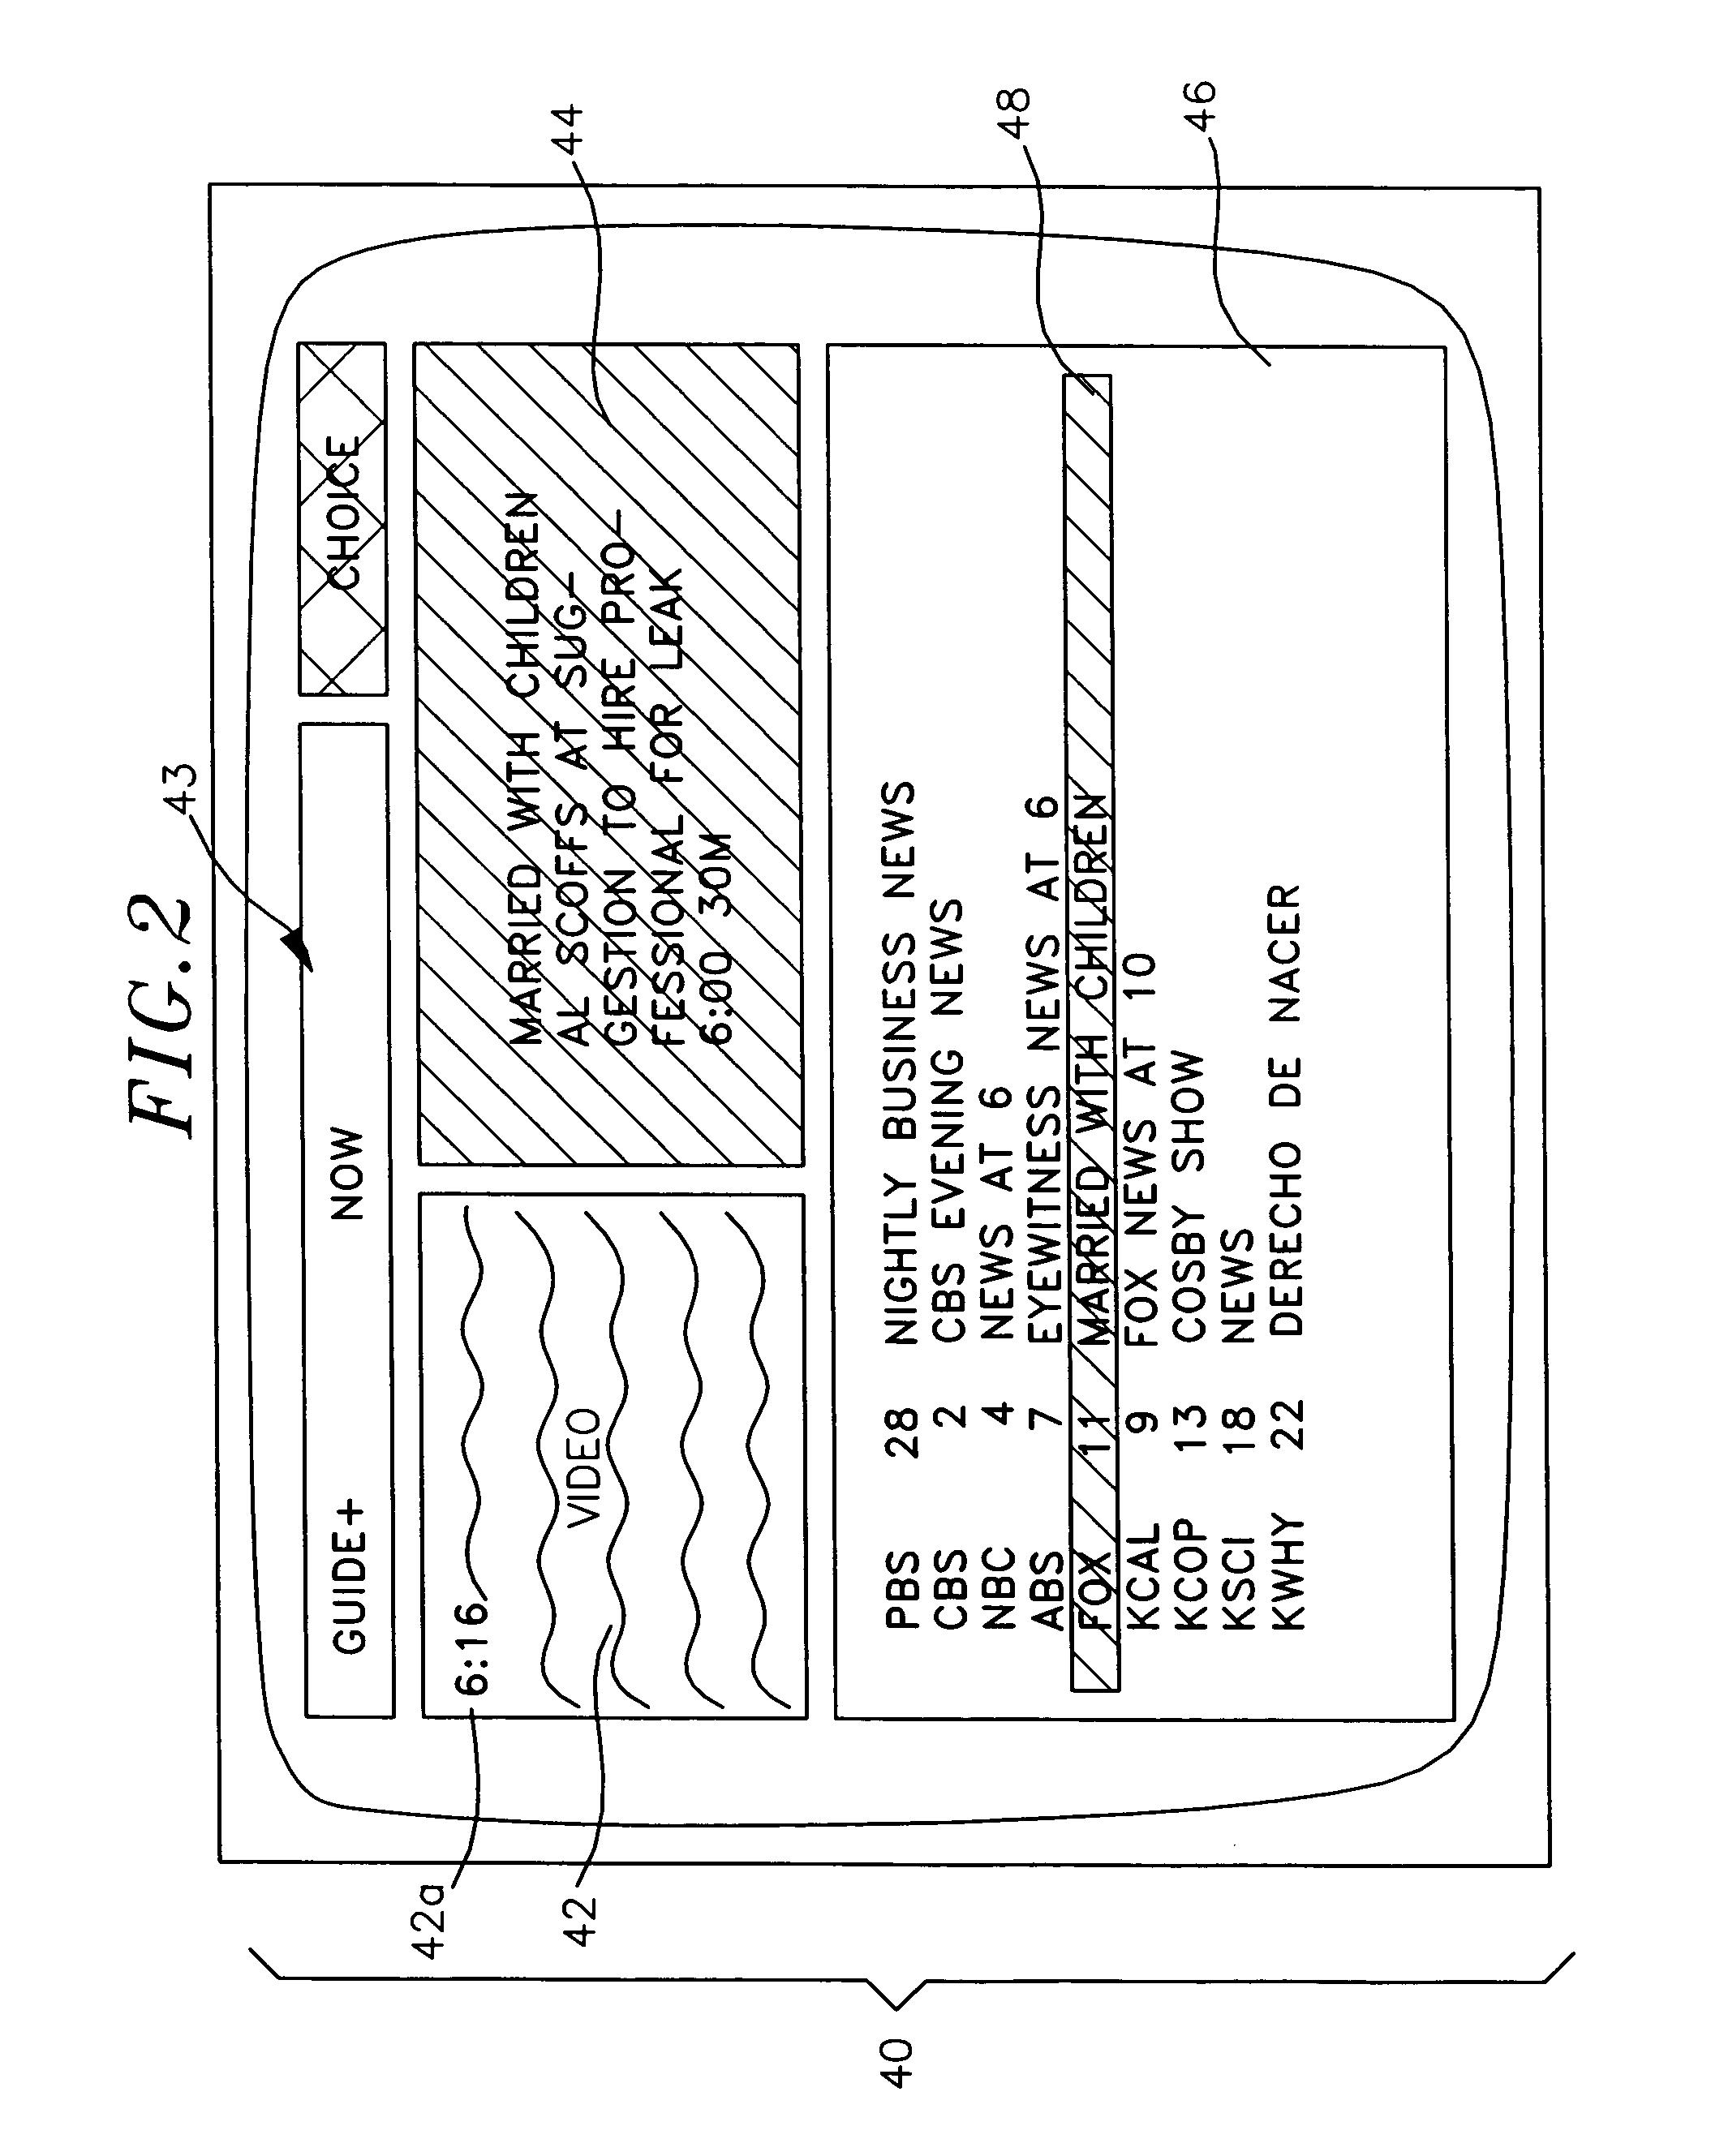 Tivo Setup Diagram,Setup Free Download Printable Wiring Diagrams